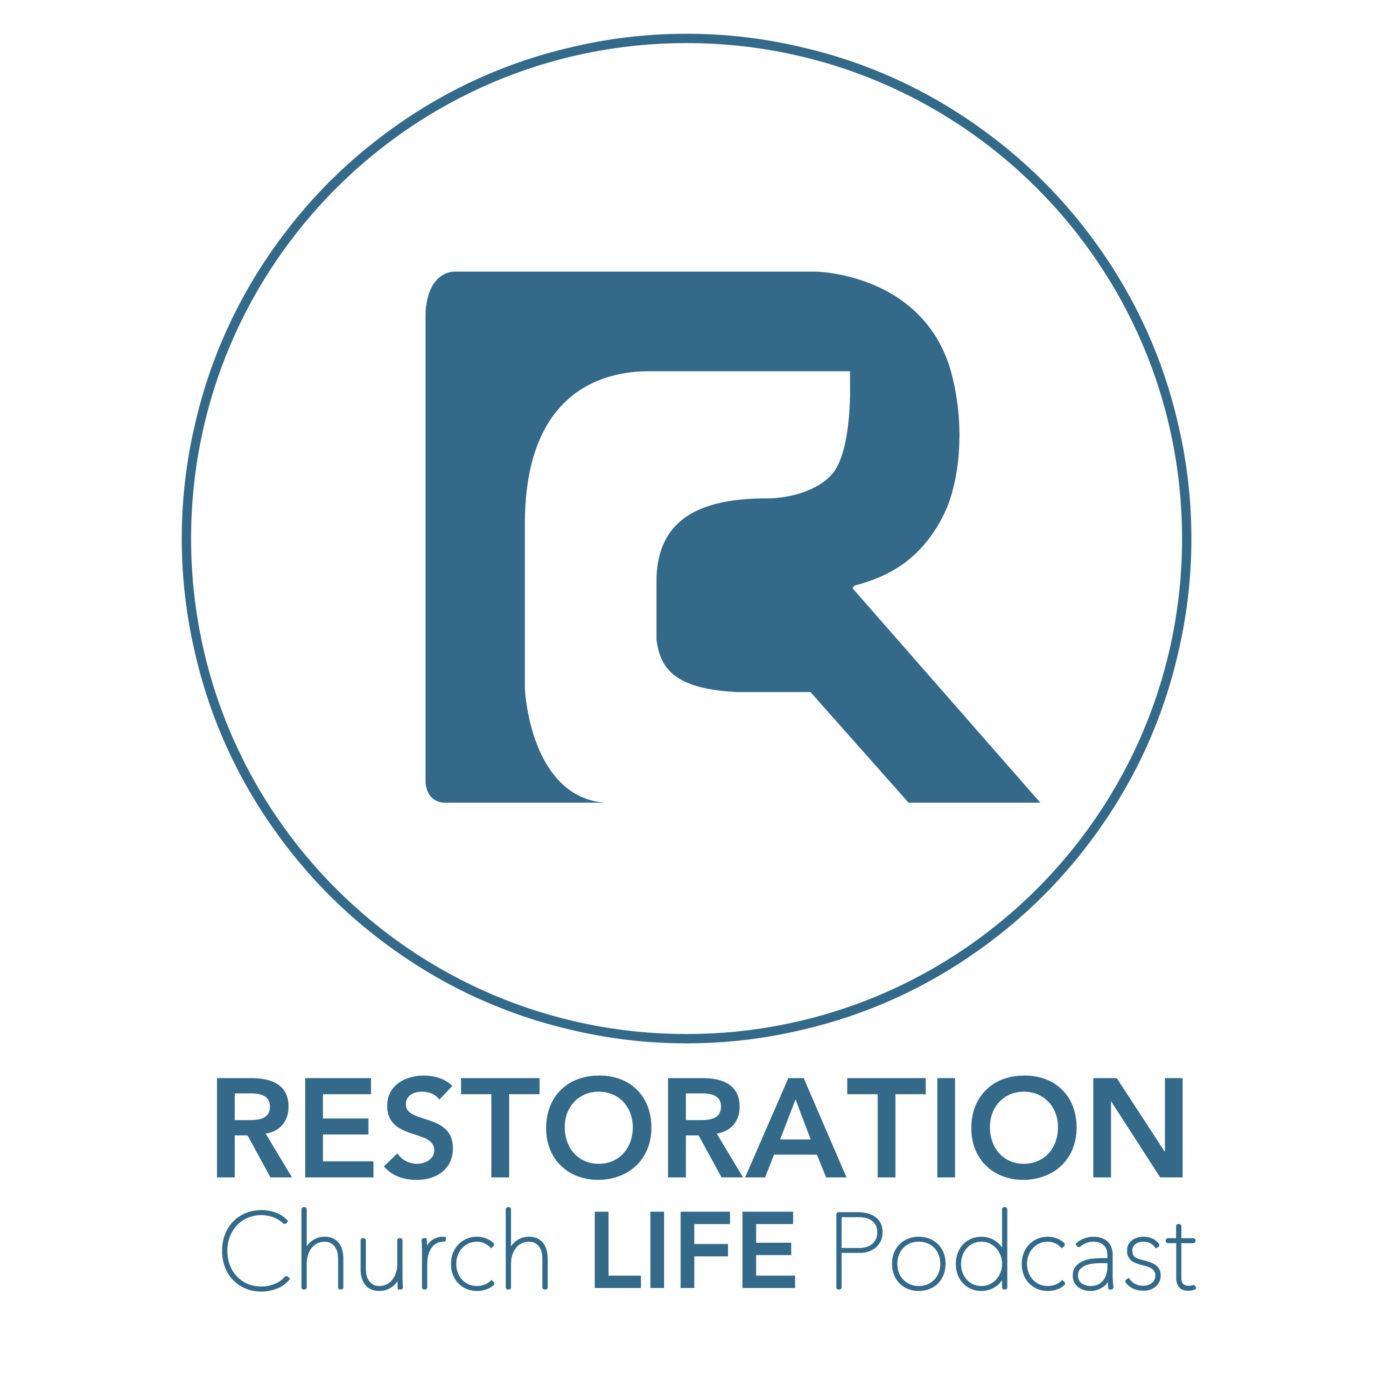 Church Life Podcast - Restoration Church | Listen Notes